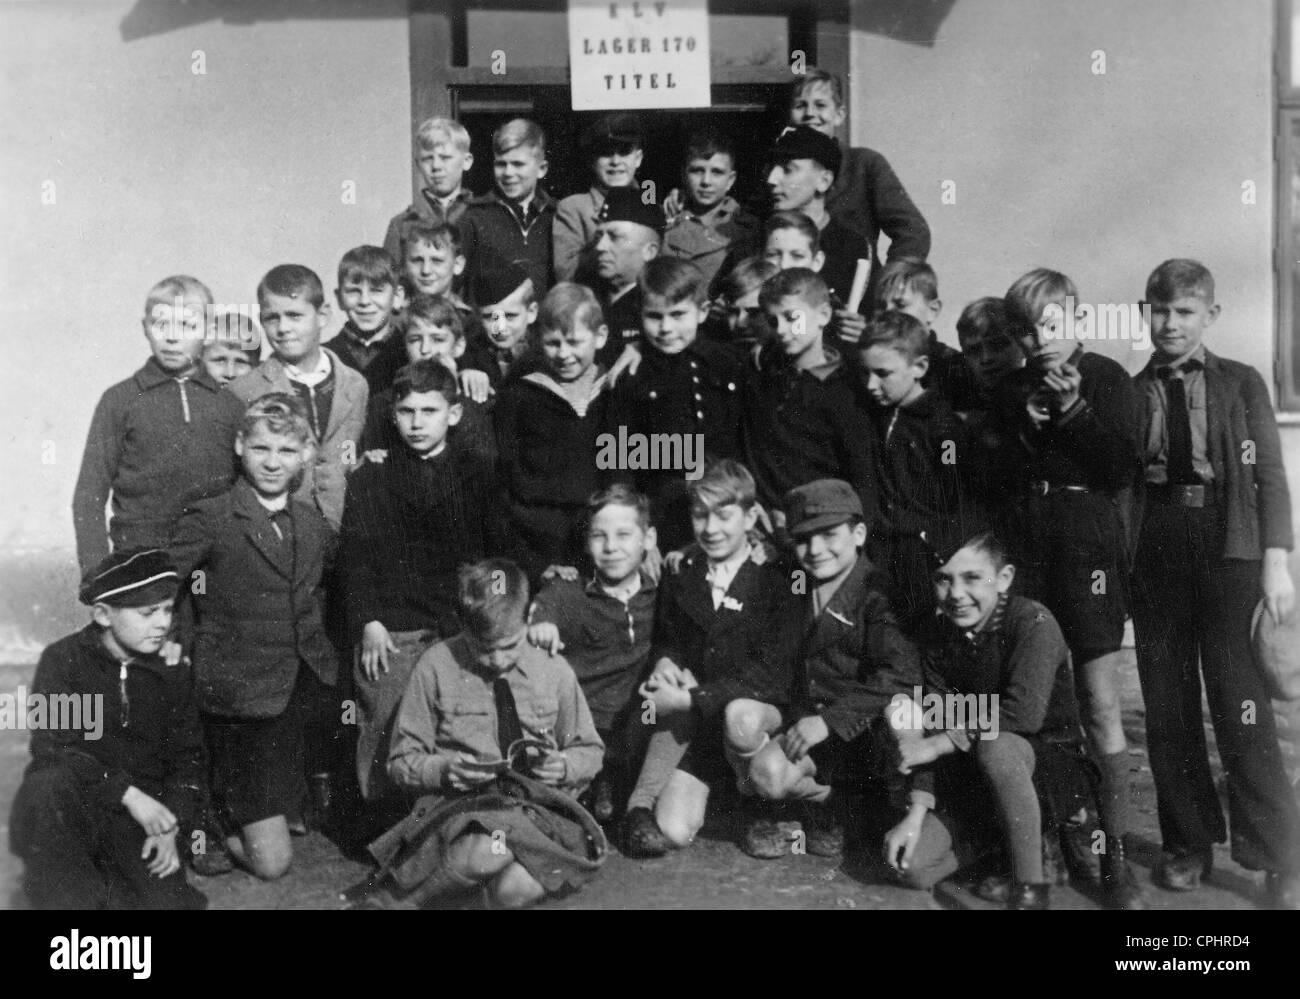 Kinderlandverschickung (sending of children to the land) to Hungary, 1942 Stock Photo